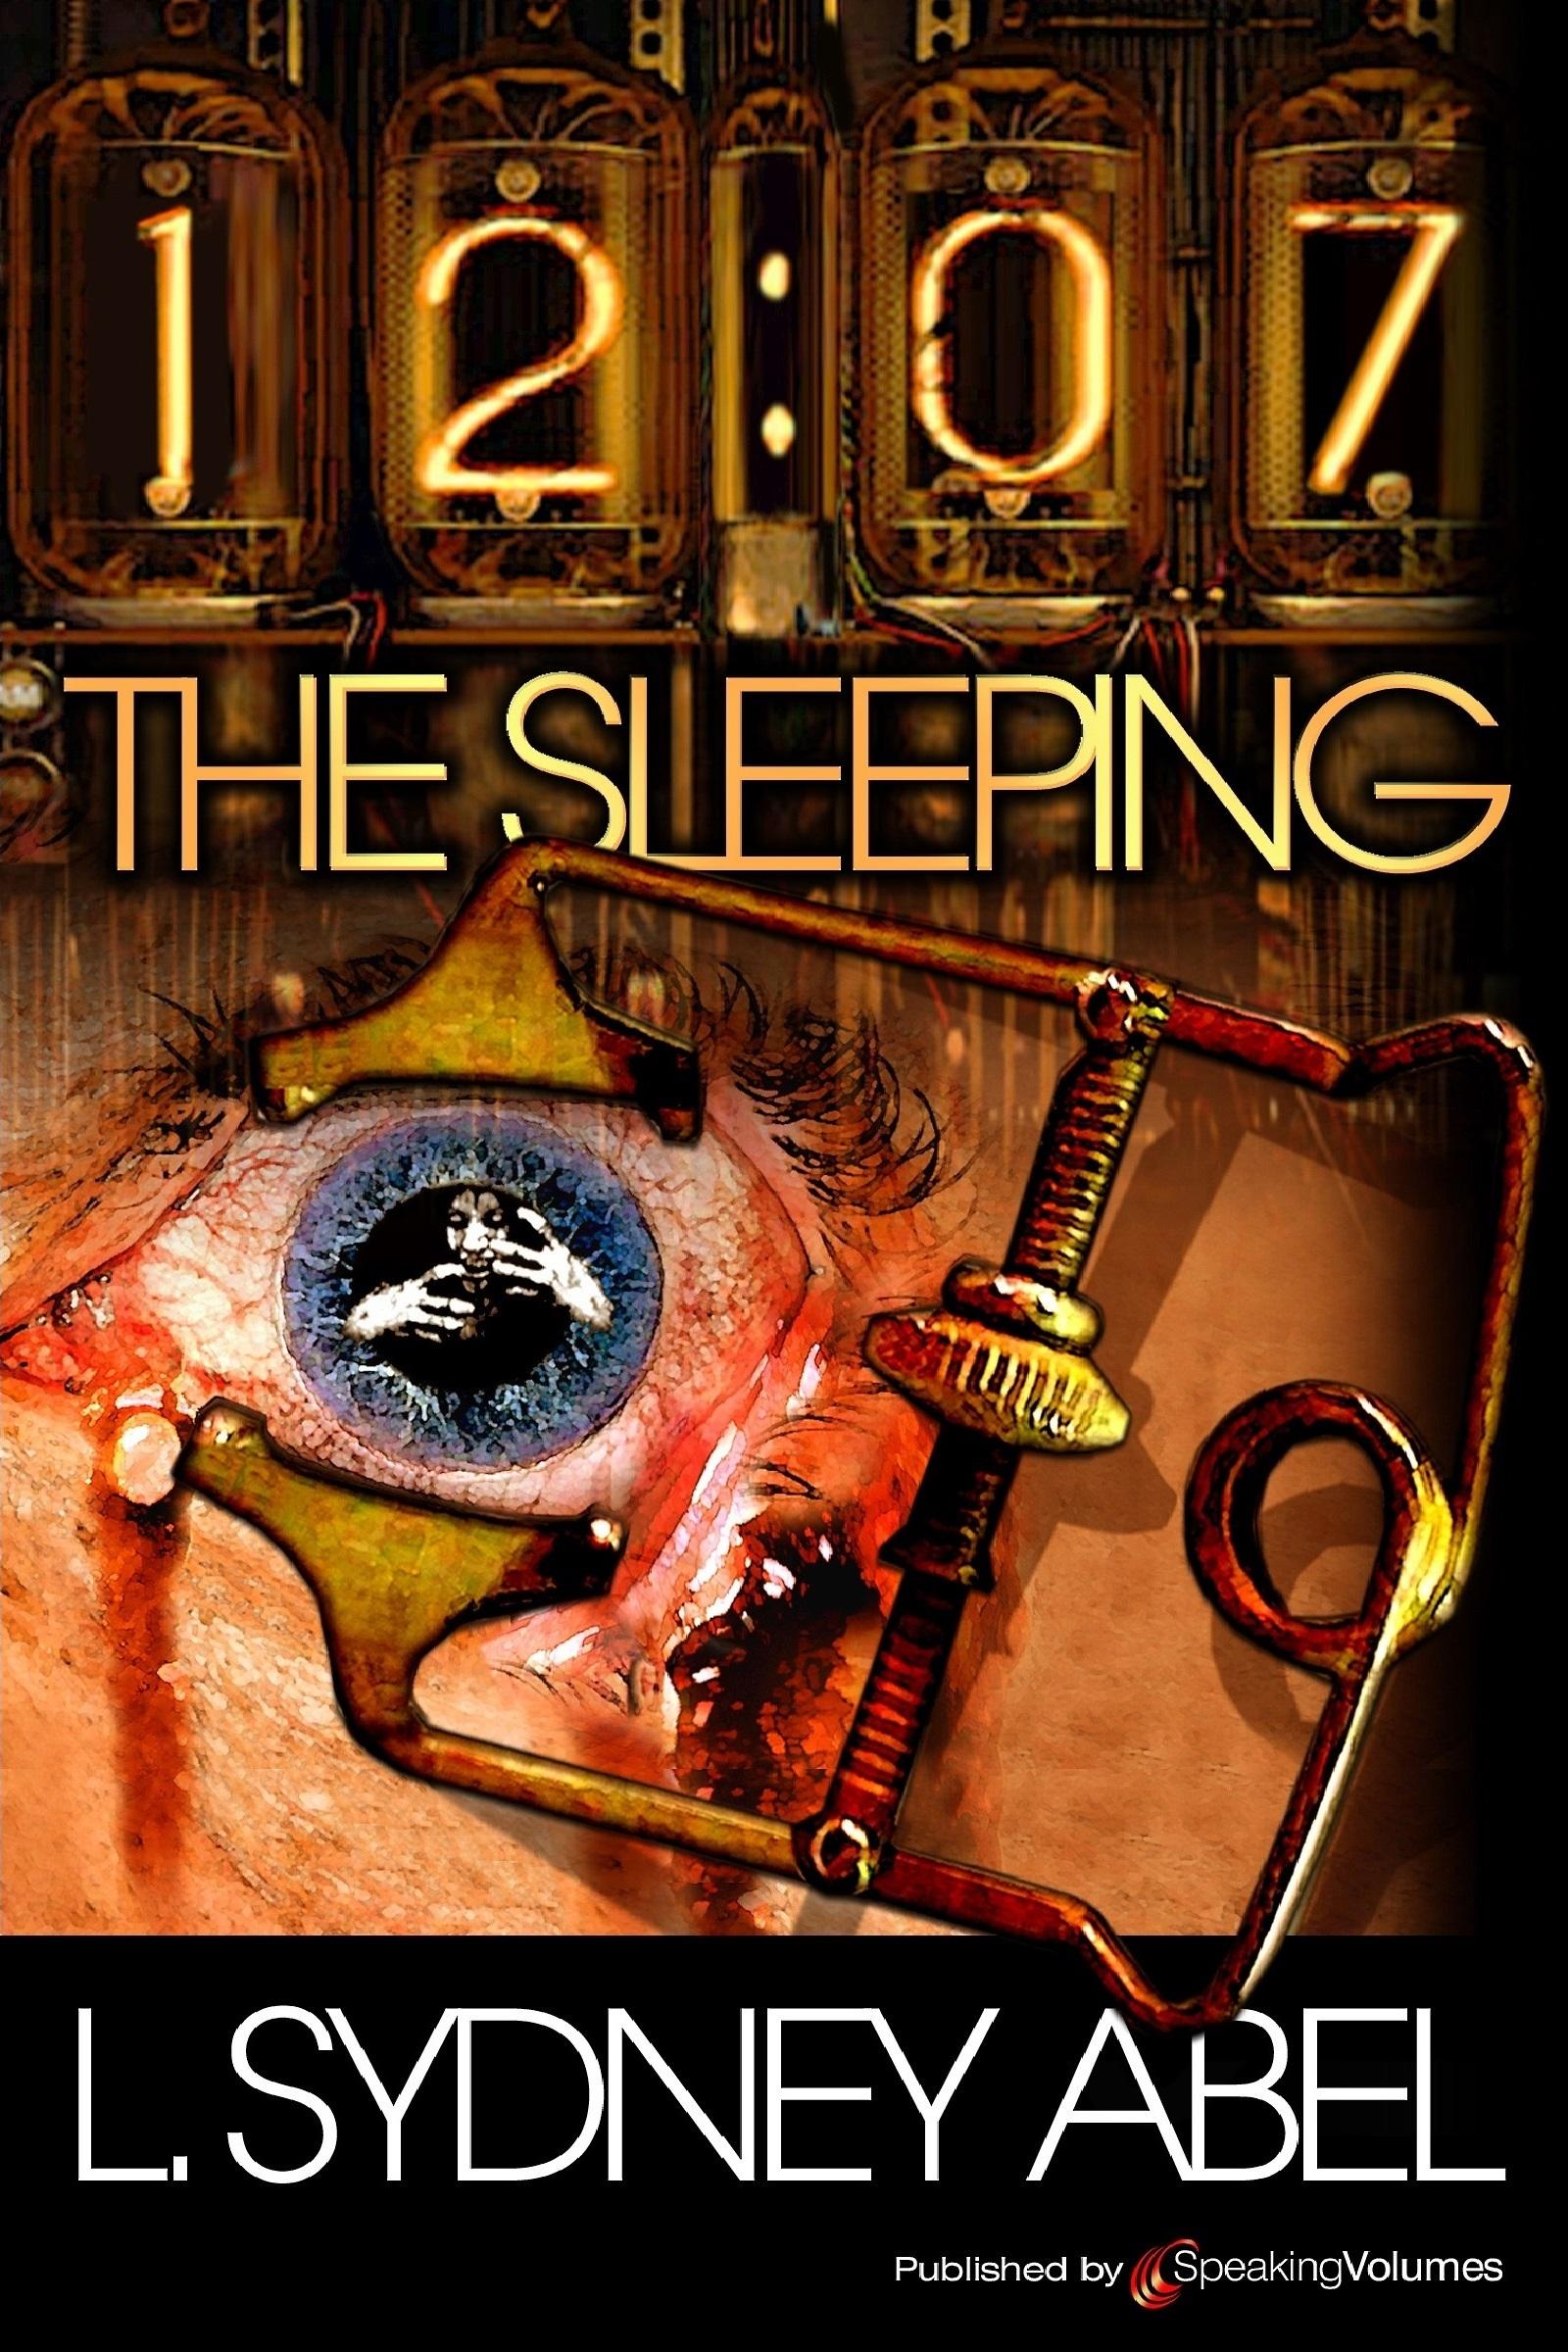 12:07 The Sleeping L. Sydney Abel